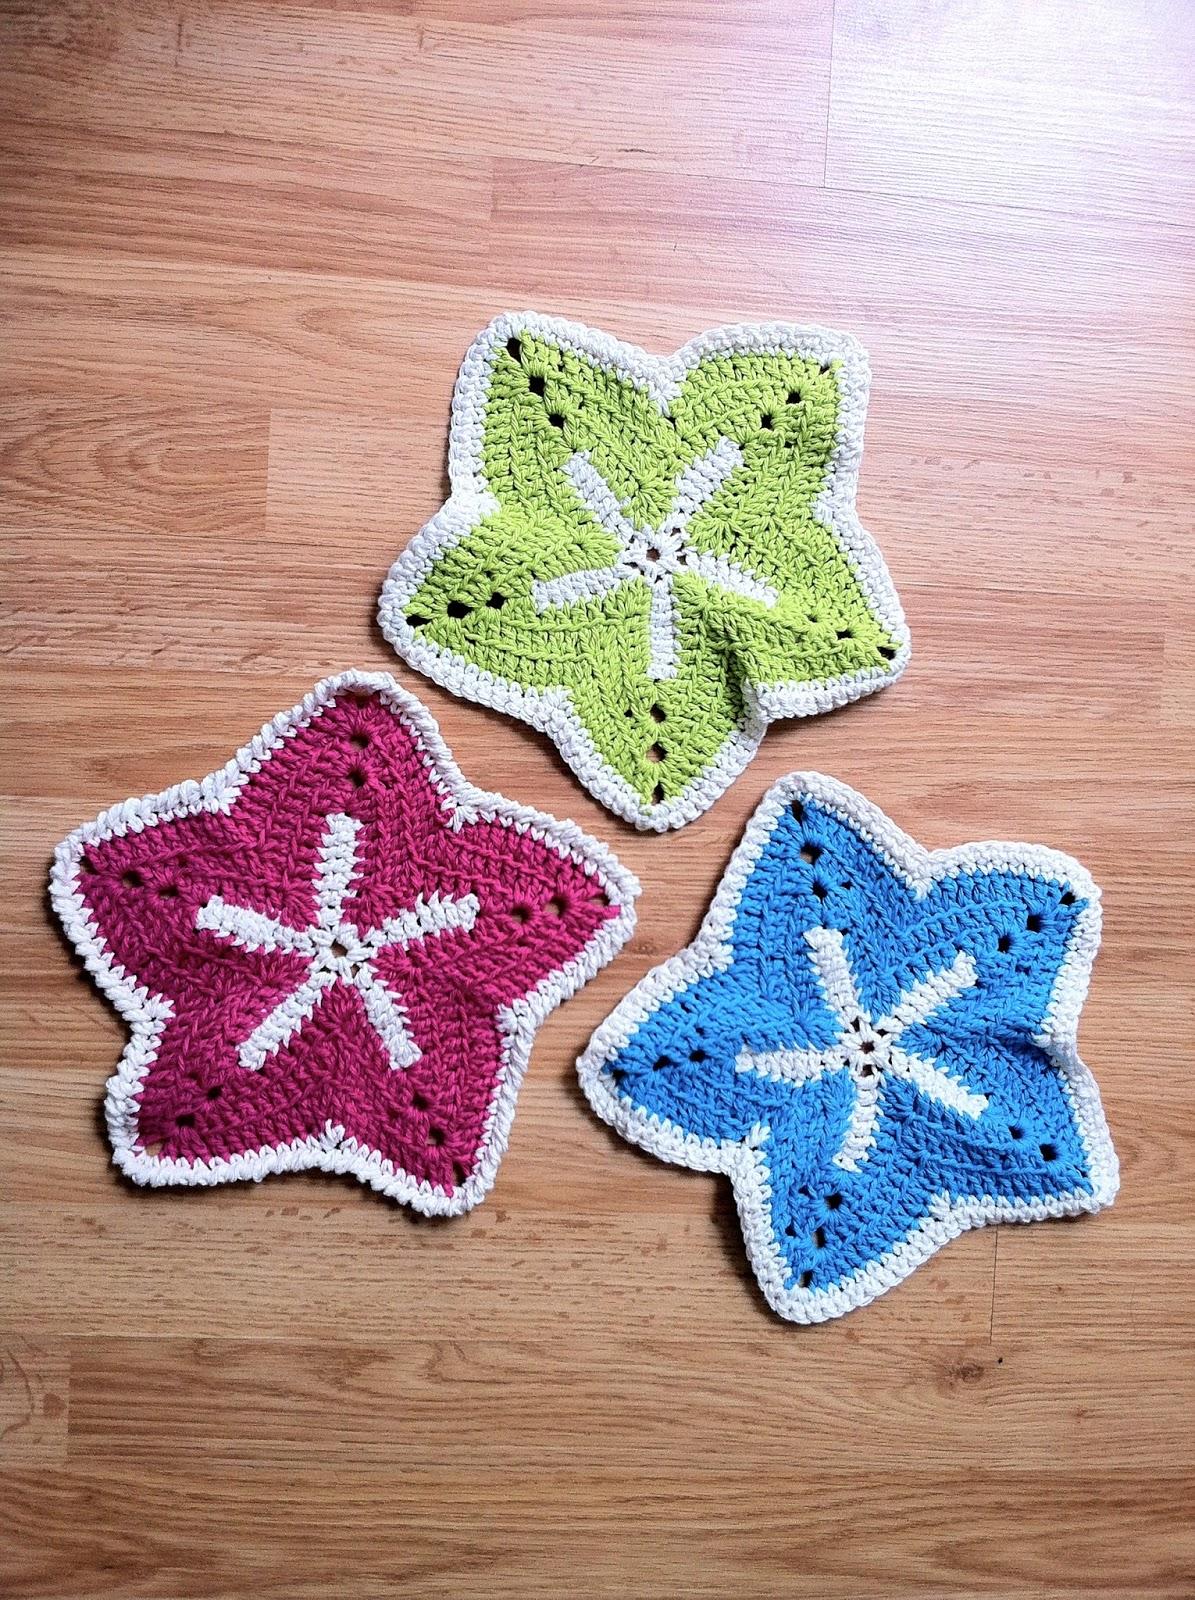 Free Crochet Starfish Dishcloth Pattern : Crochet Starfish Washcloth The Way I Crochet